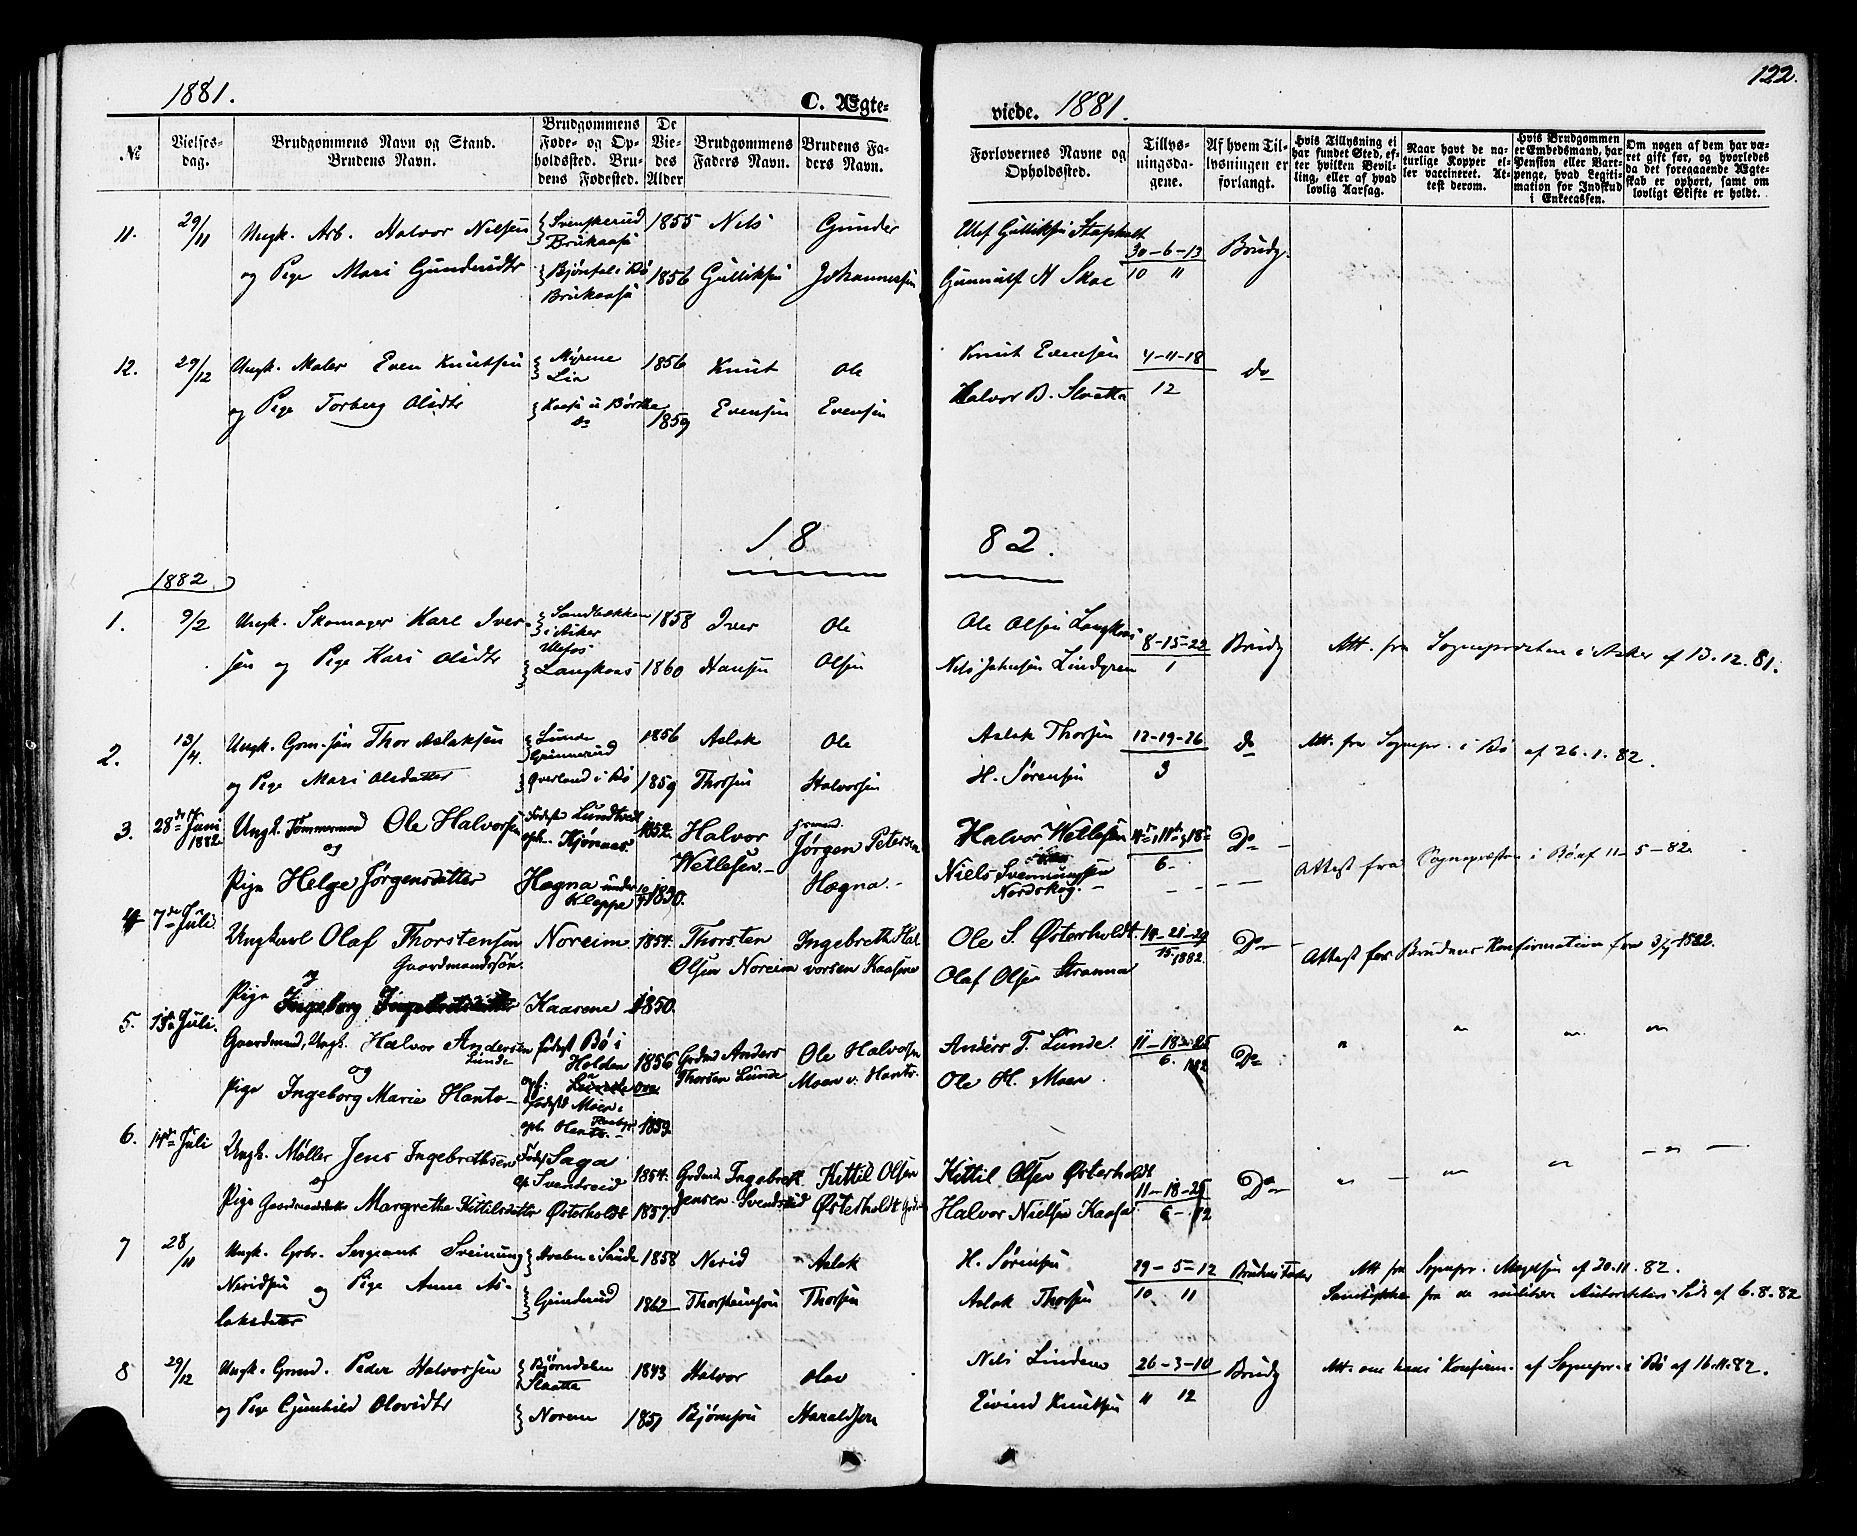 SAKO, Lunde kirkebøker, F/Fa/L0001: Ministerialbok nr. I 1, 1866-1883, s. 122